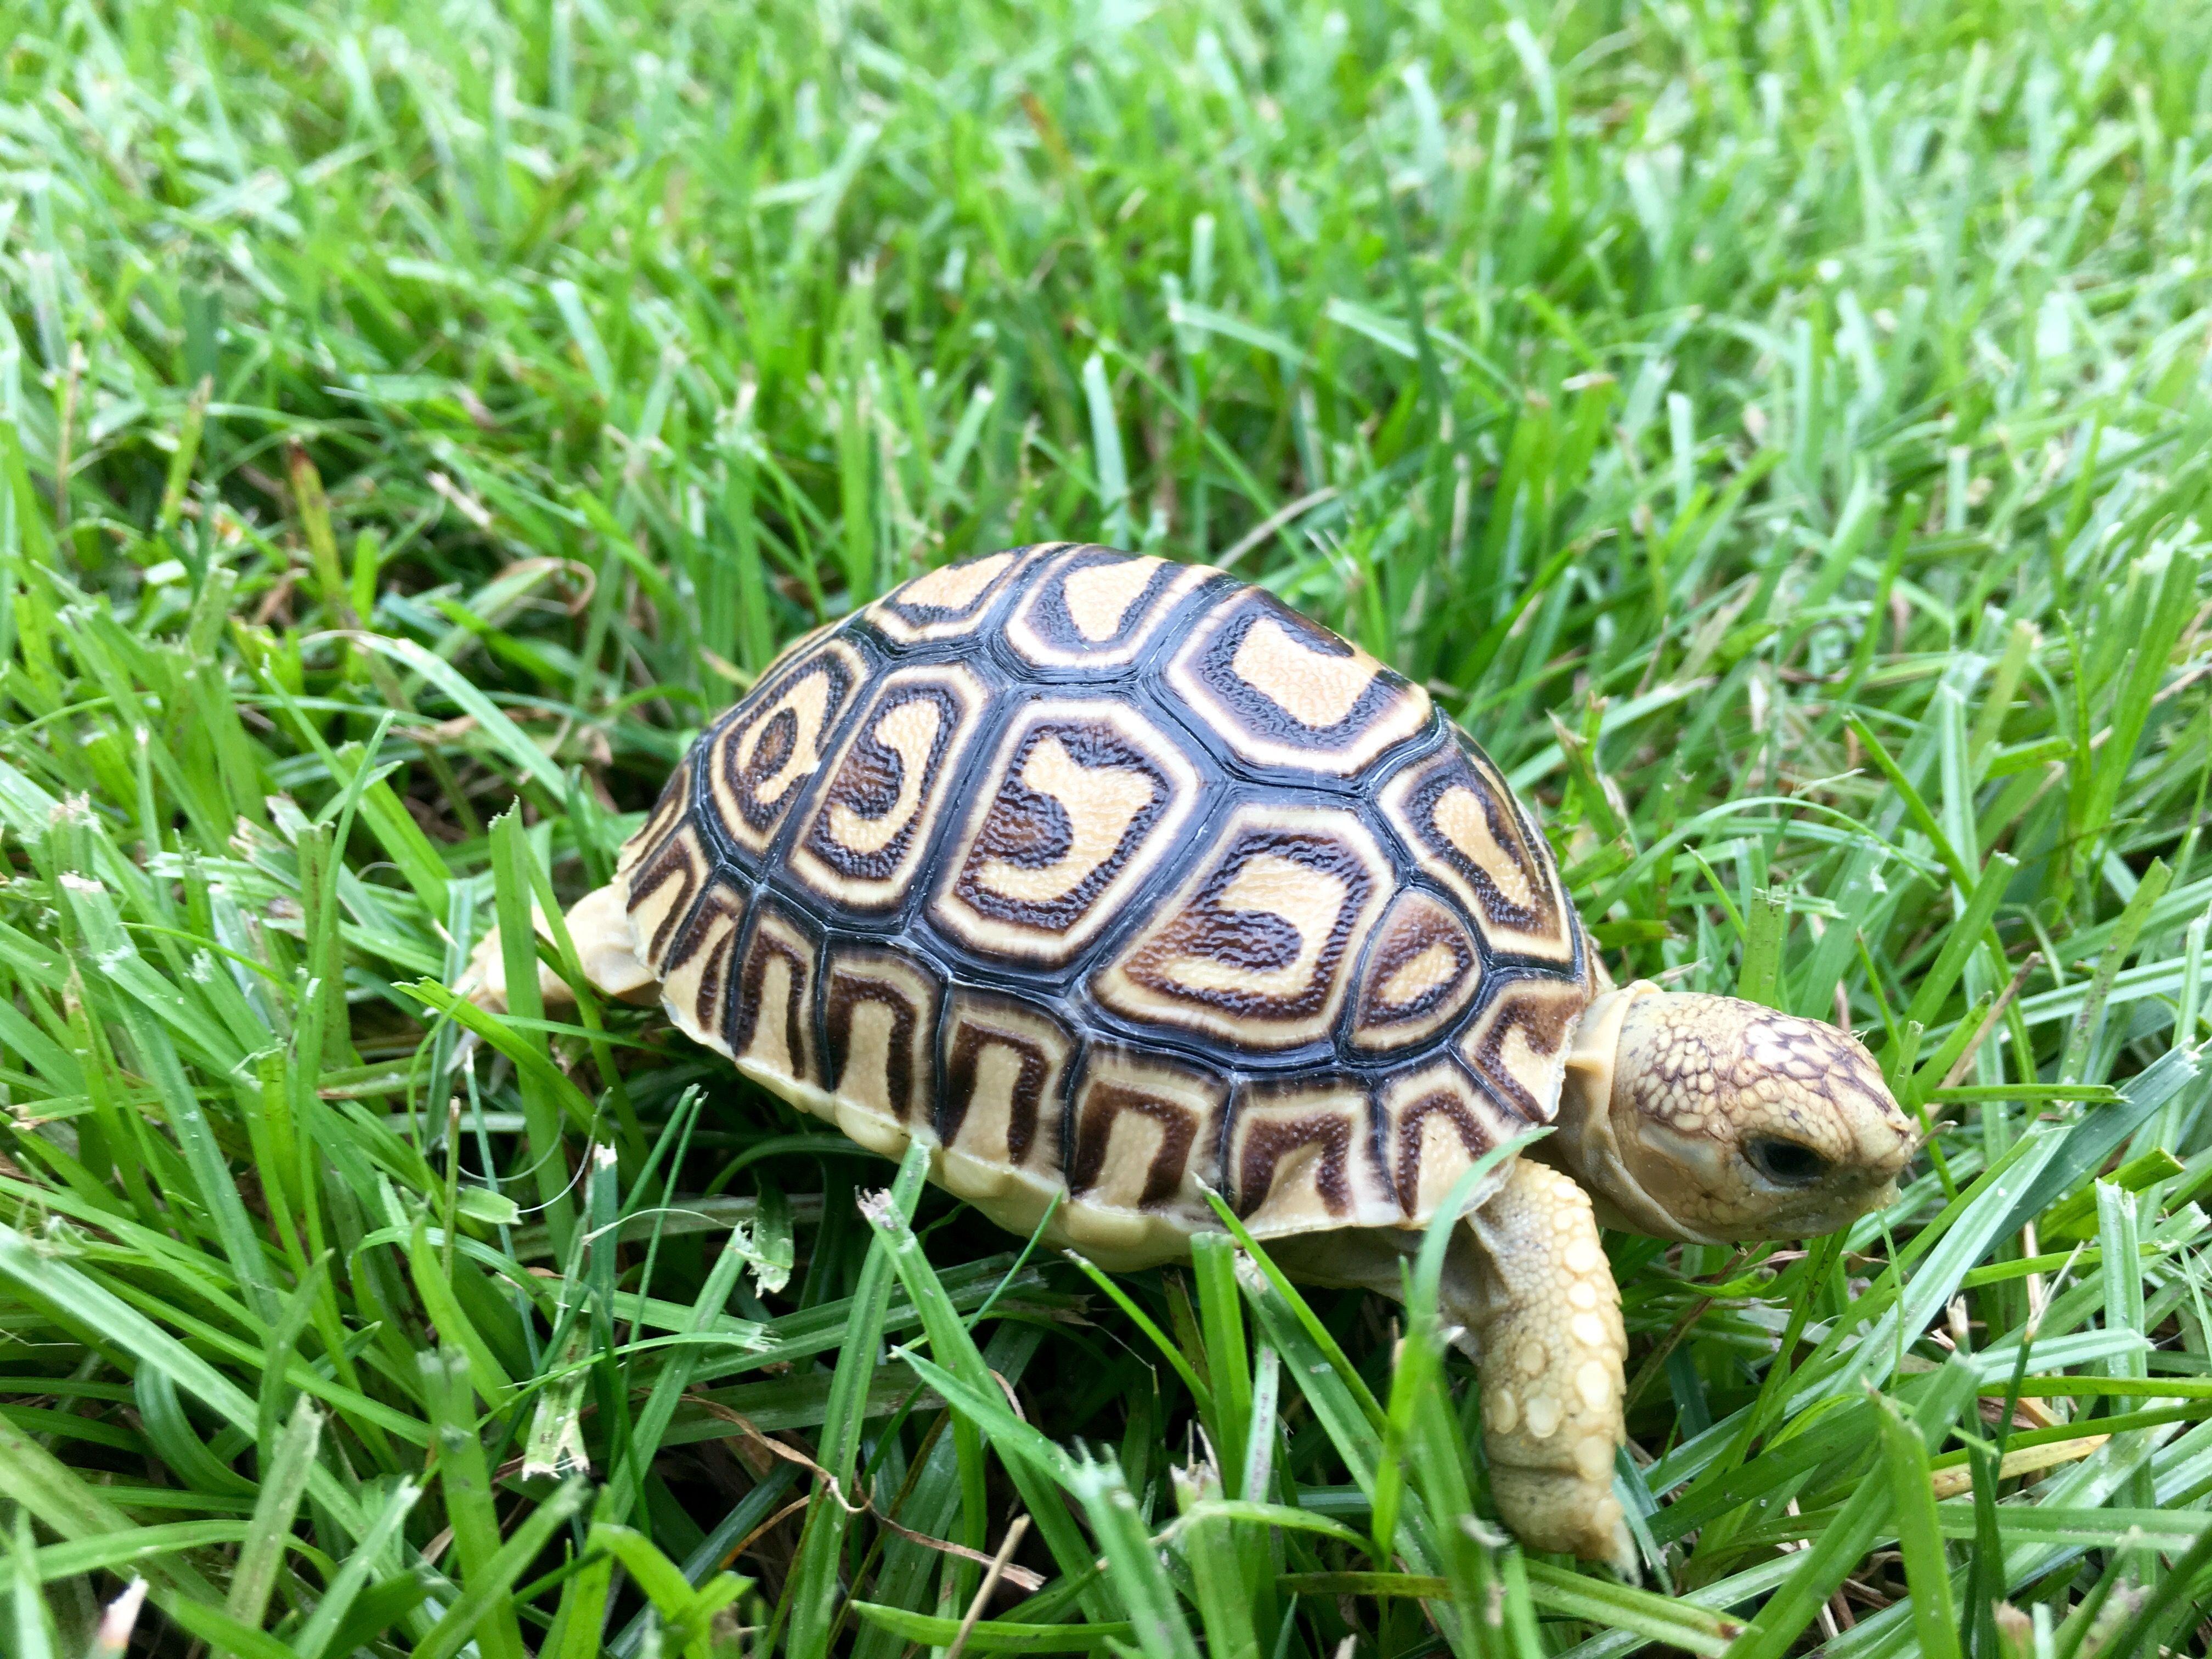 Baby Leopard Tortoises For Sale Leopard Tortoise Hatchlings For Sale Online Leopard Tortoise Baby Leopard Tortoises